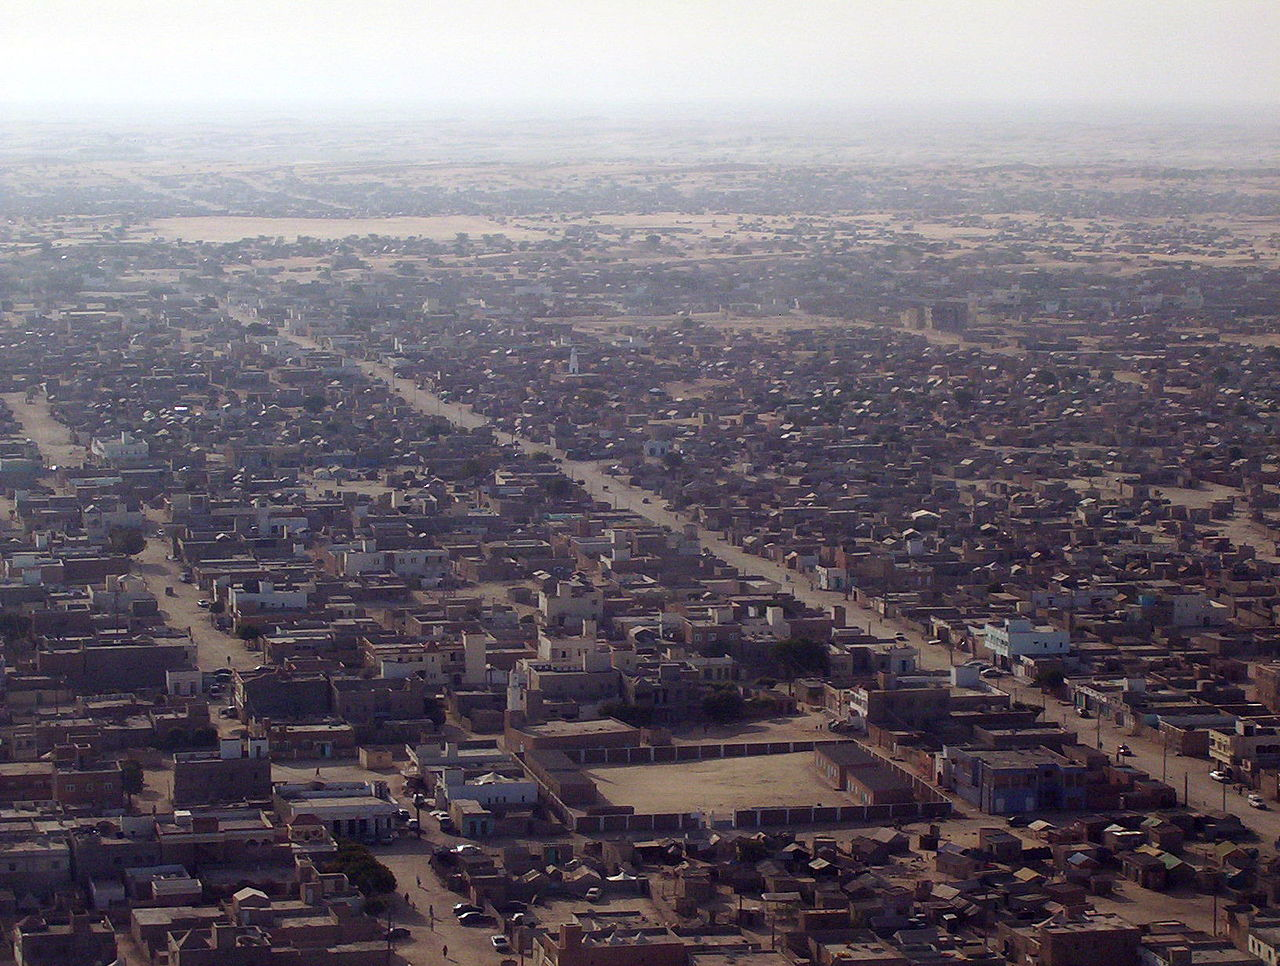 Tampilan udara Nouakchott. Populasi Nouakchott telah meningkat dari 20.000 pada tahun 1969 menjadi hampir 1 juta pada tahun 2013.